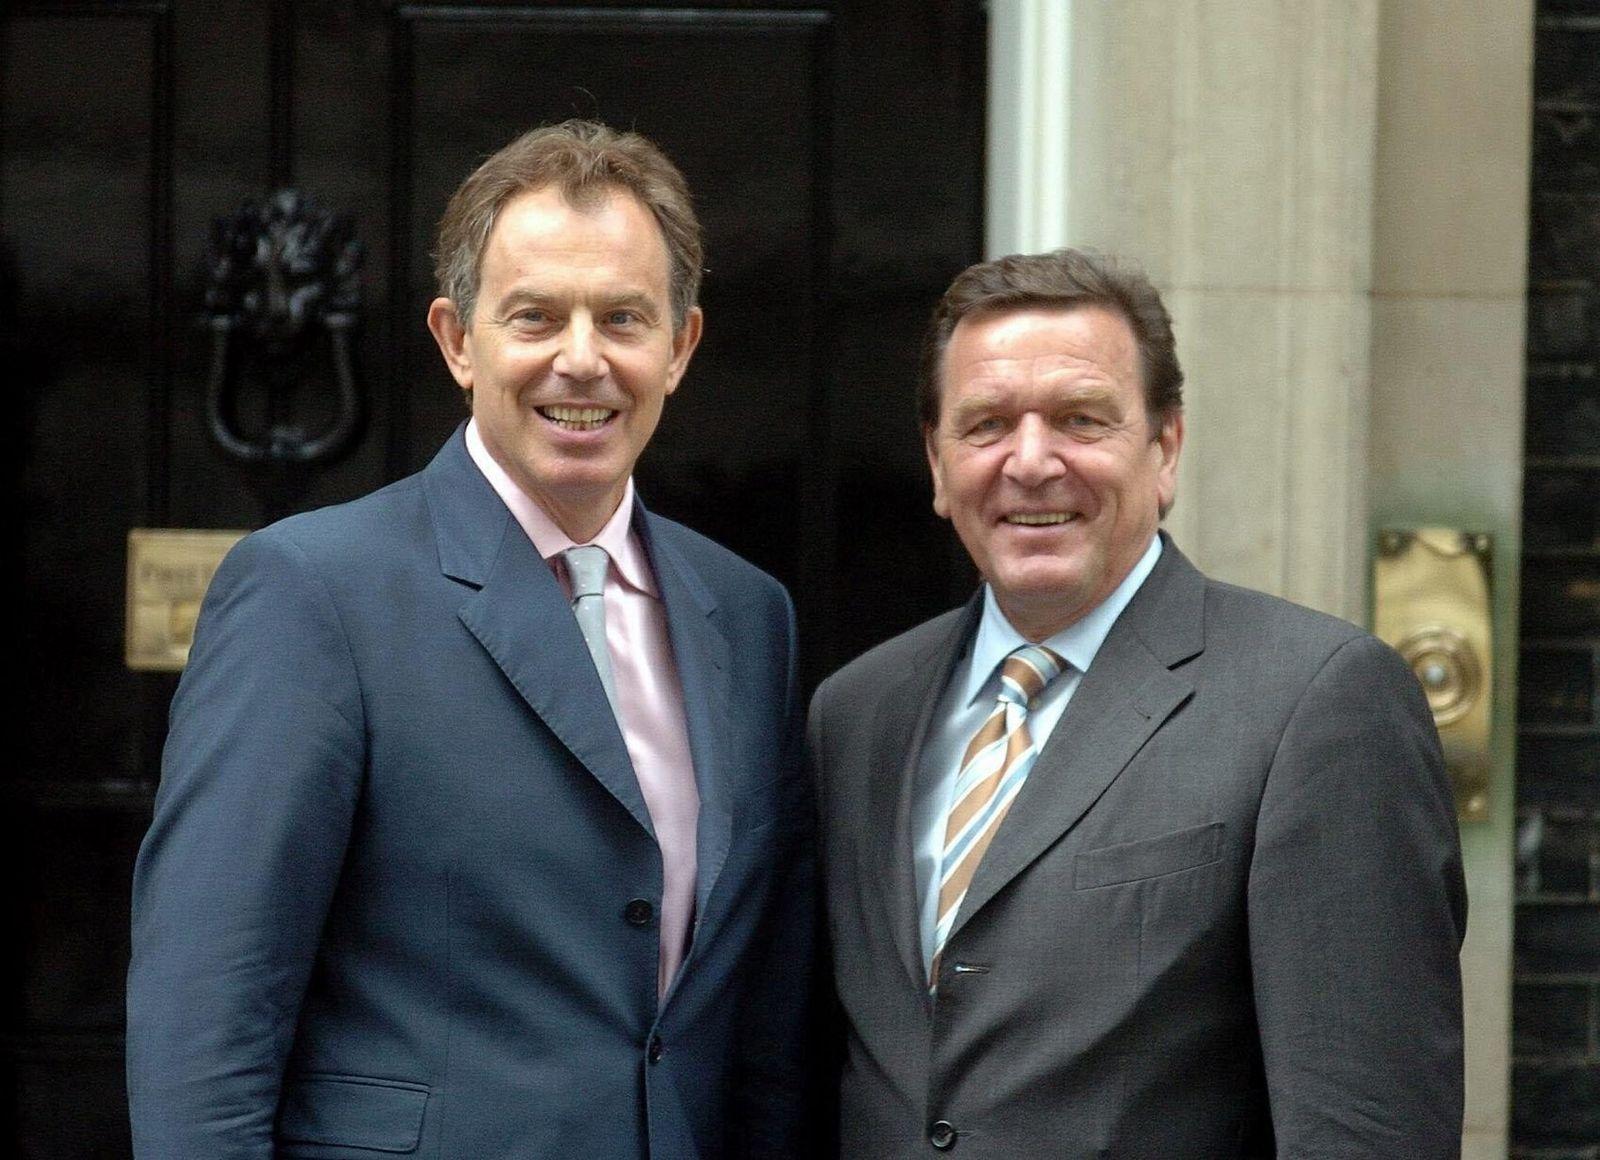 Tony Blair / Gerhard Schröder grinsend